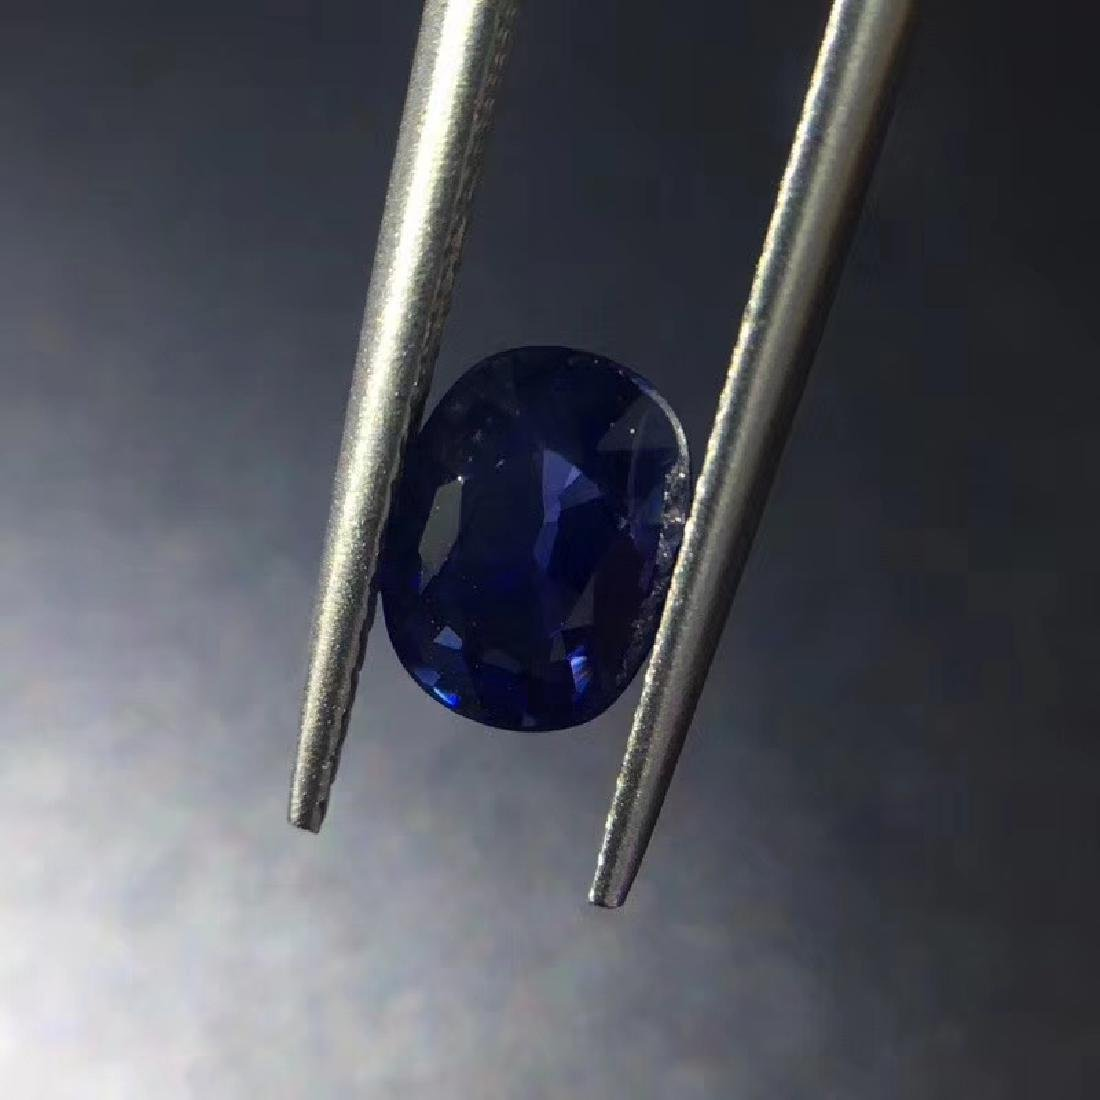 1.43 ct Sapphire 5.8*7.6*3.4 mm Oval Cut - 4